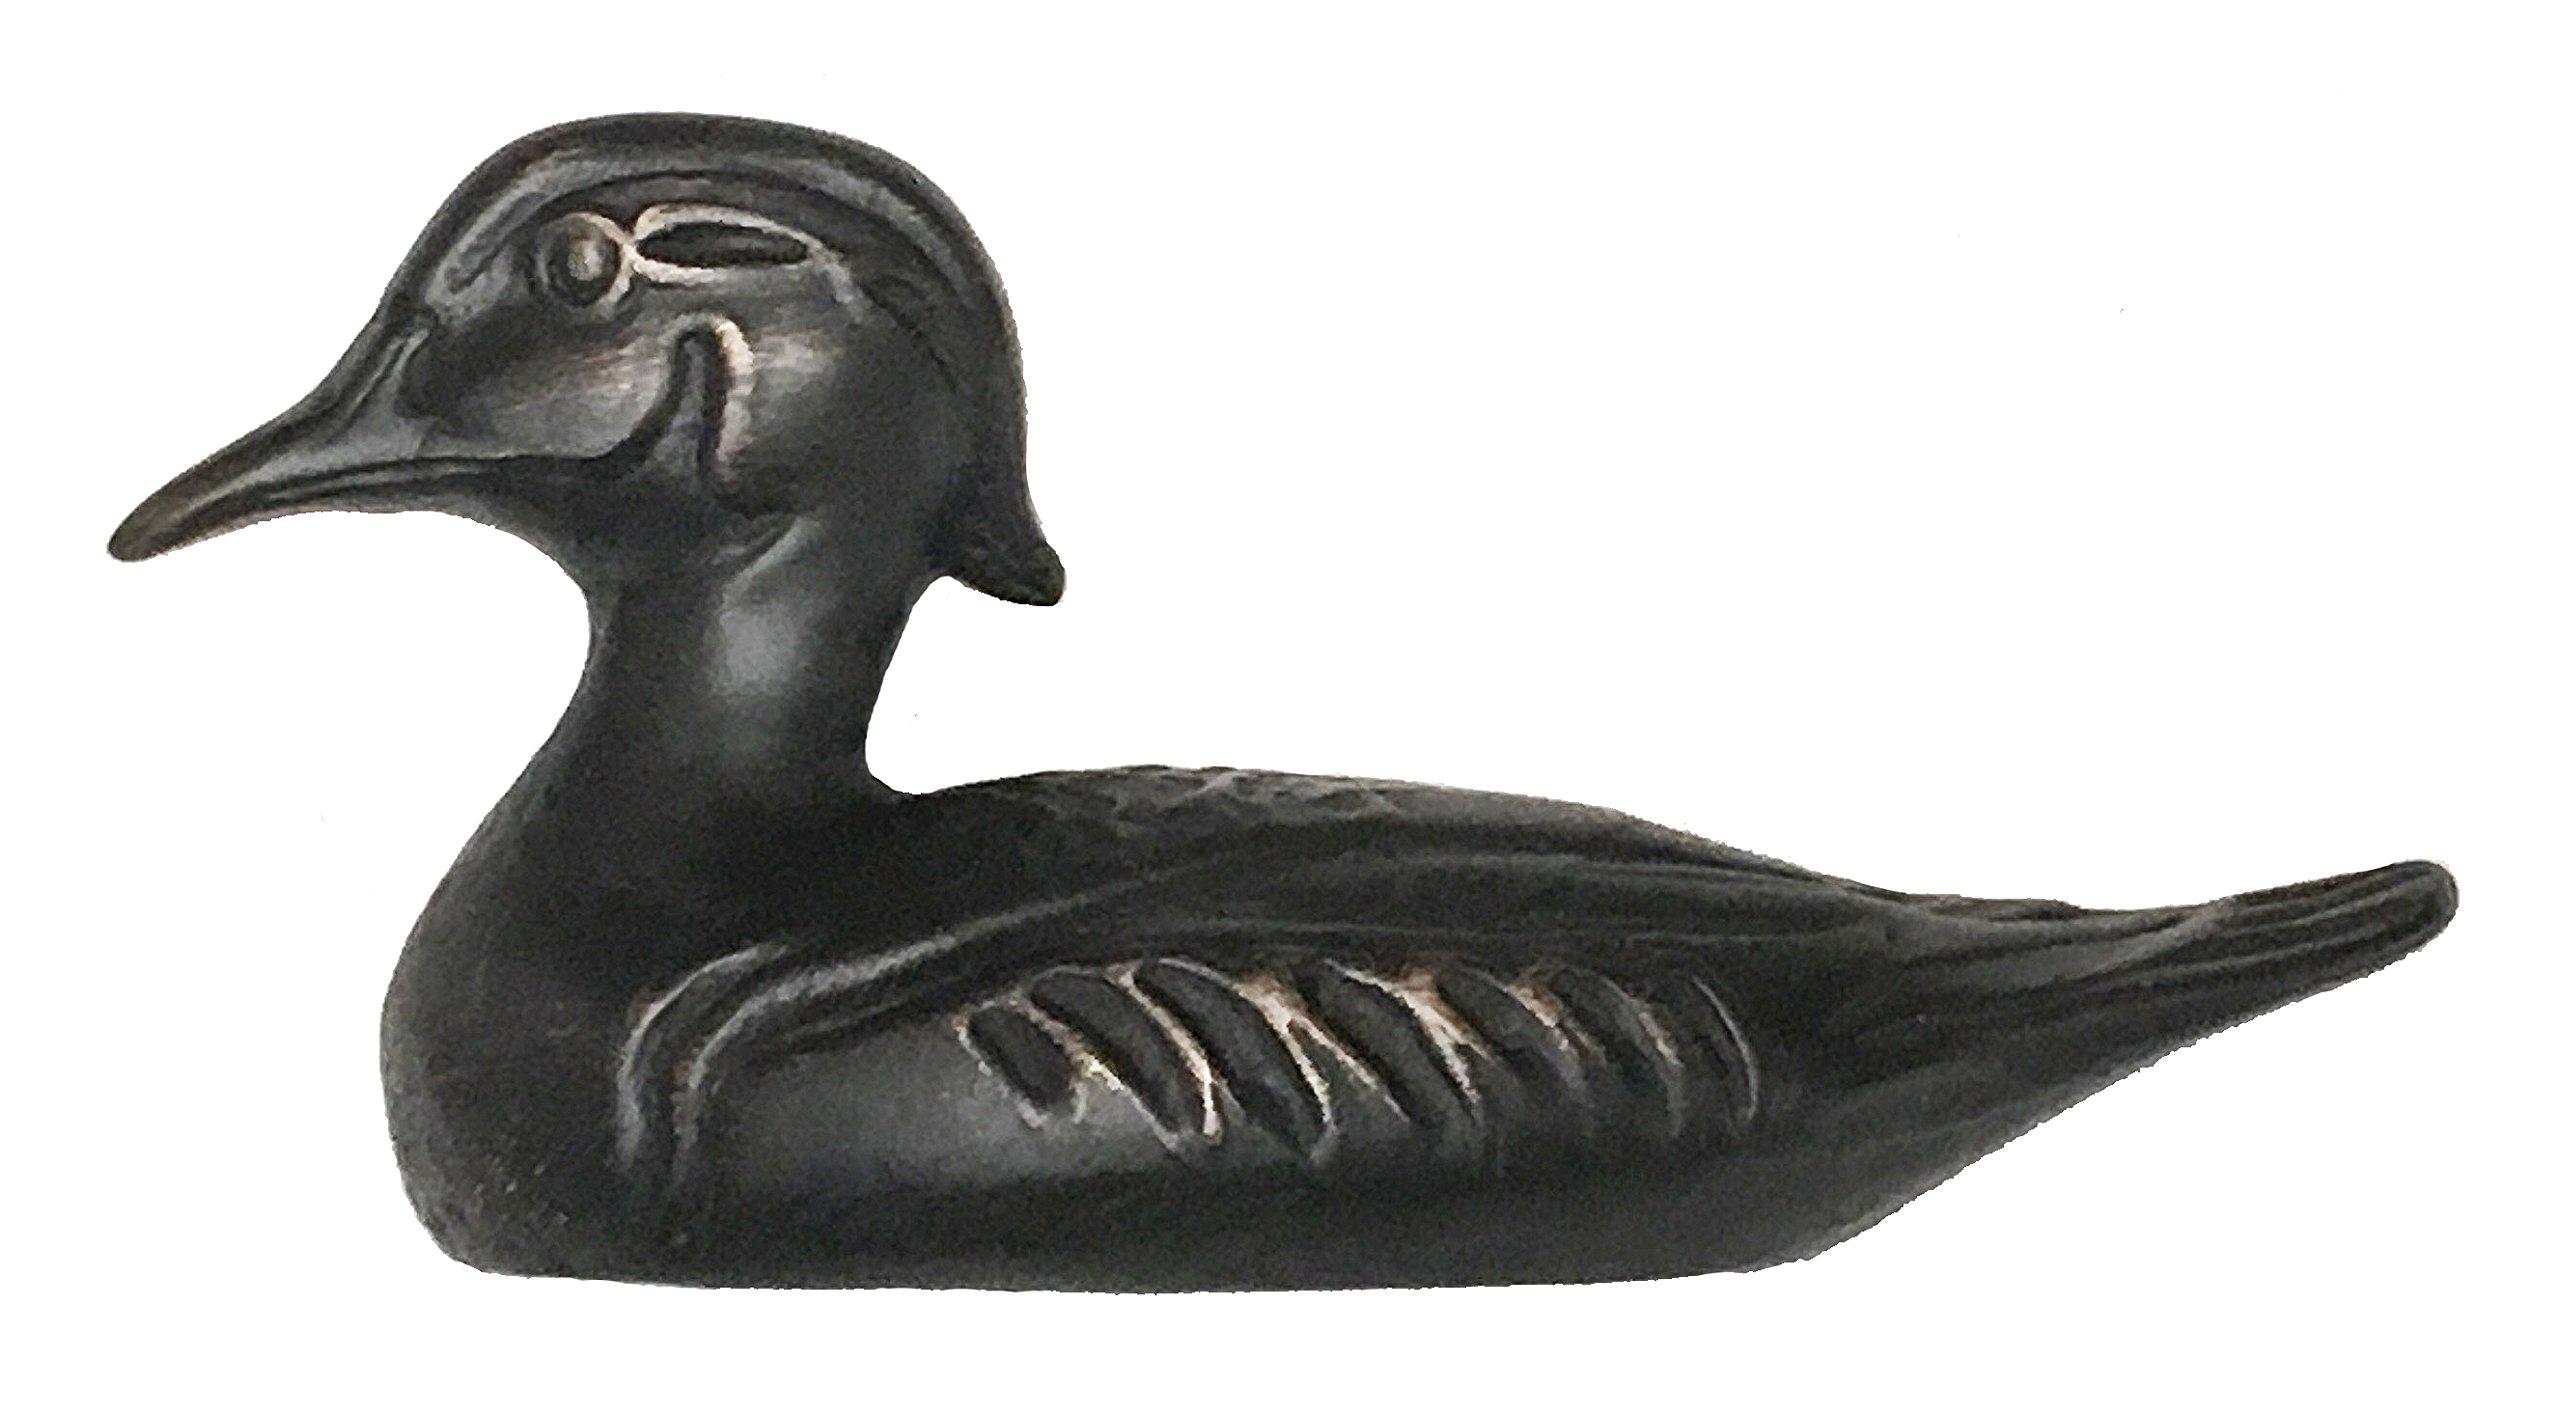 D'Artefax DHP93-ORB Duck Decoy Pul (Left facing) Pull Decorative Cabinets, Oil Rub Bronze